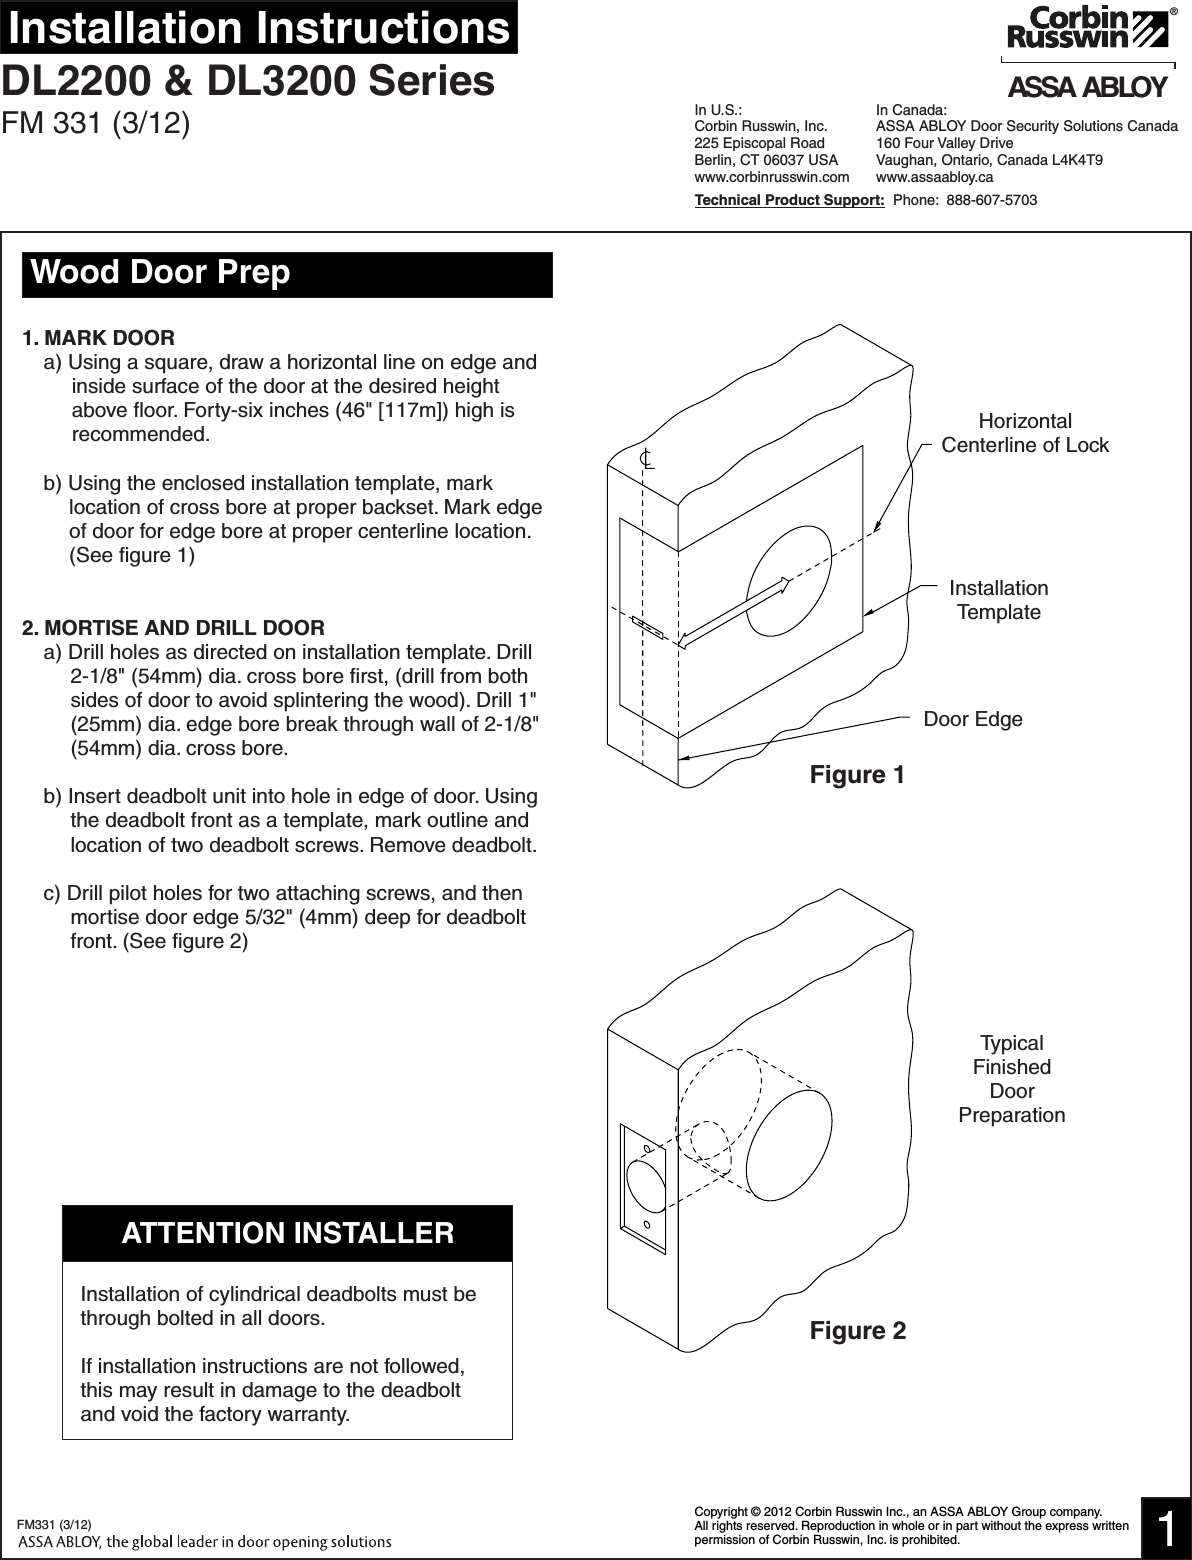 Corbin Russwin FM331 (03 12) DL2200/DL3200 Installation Instructions